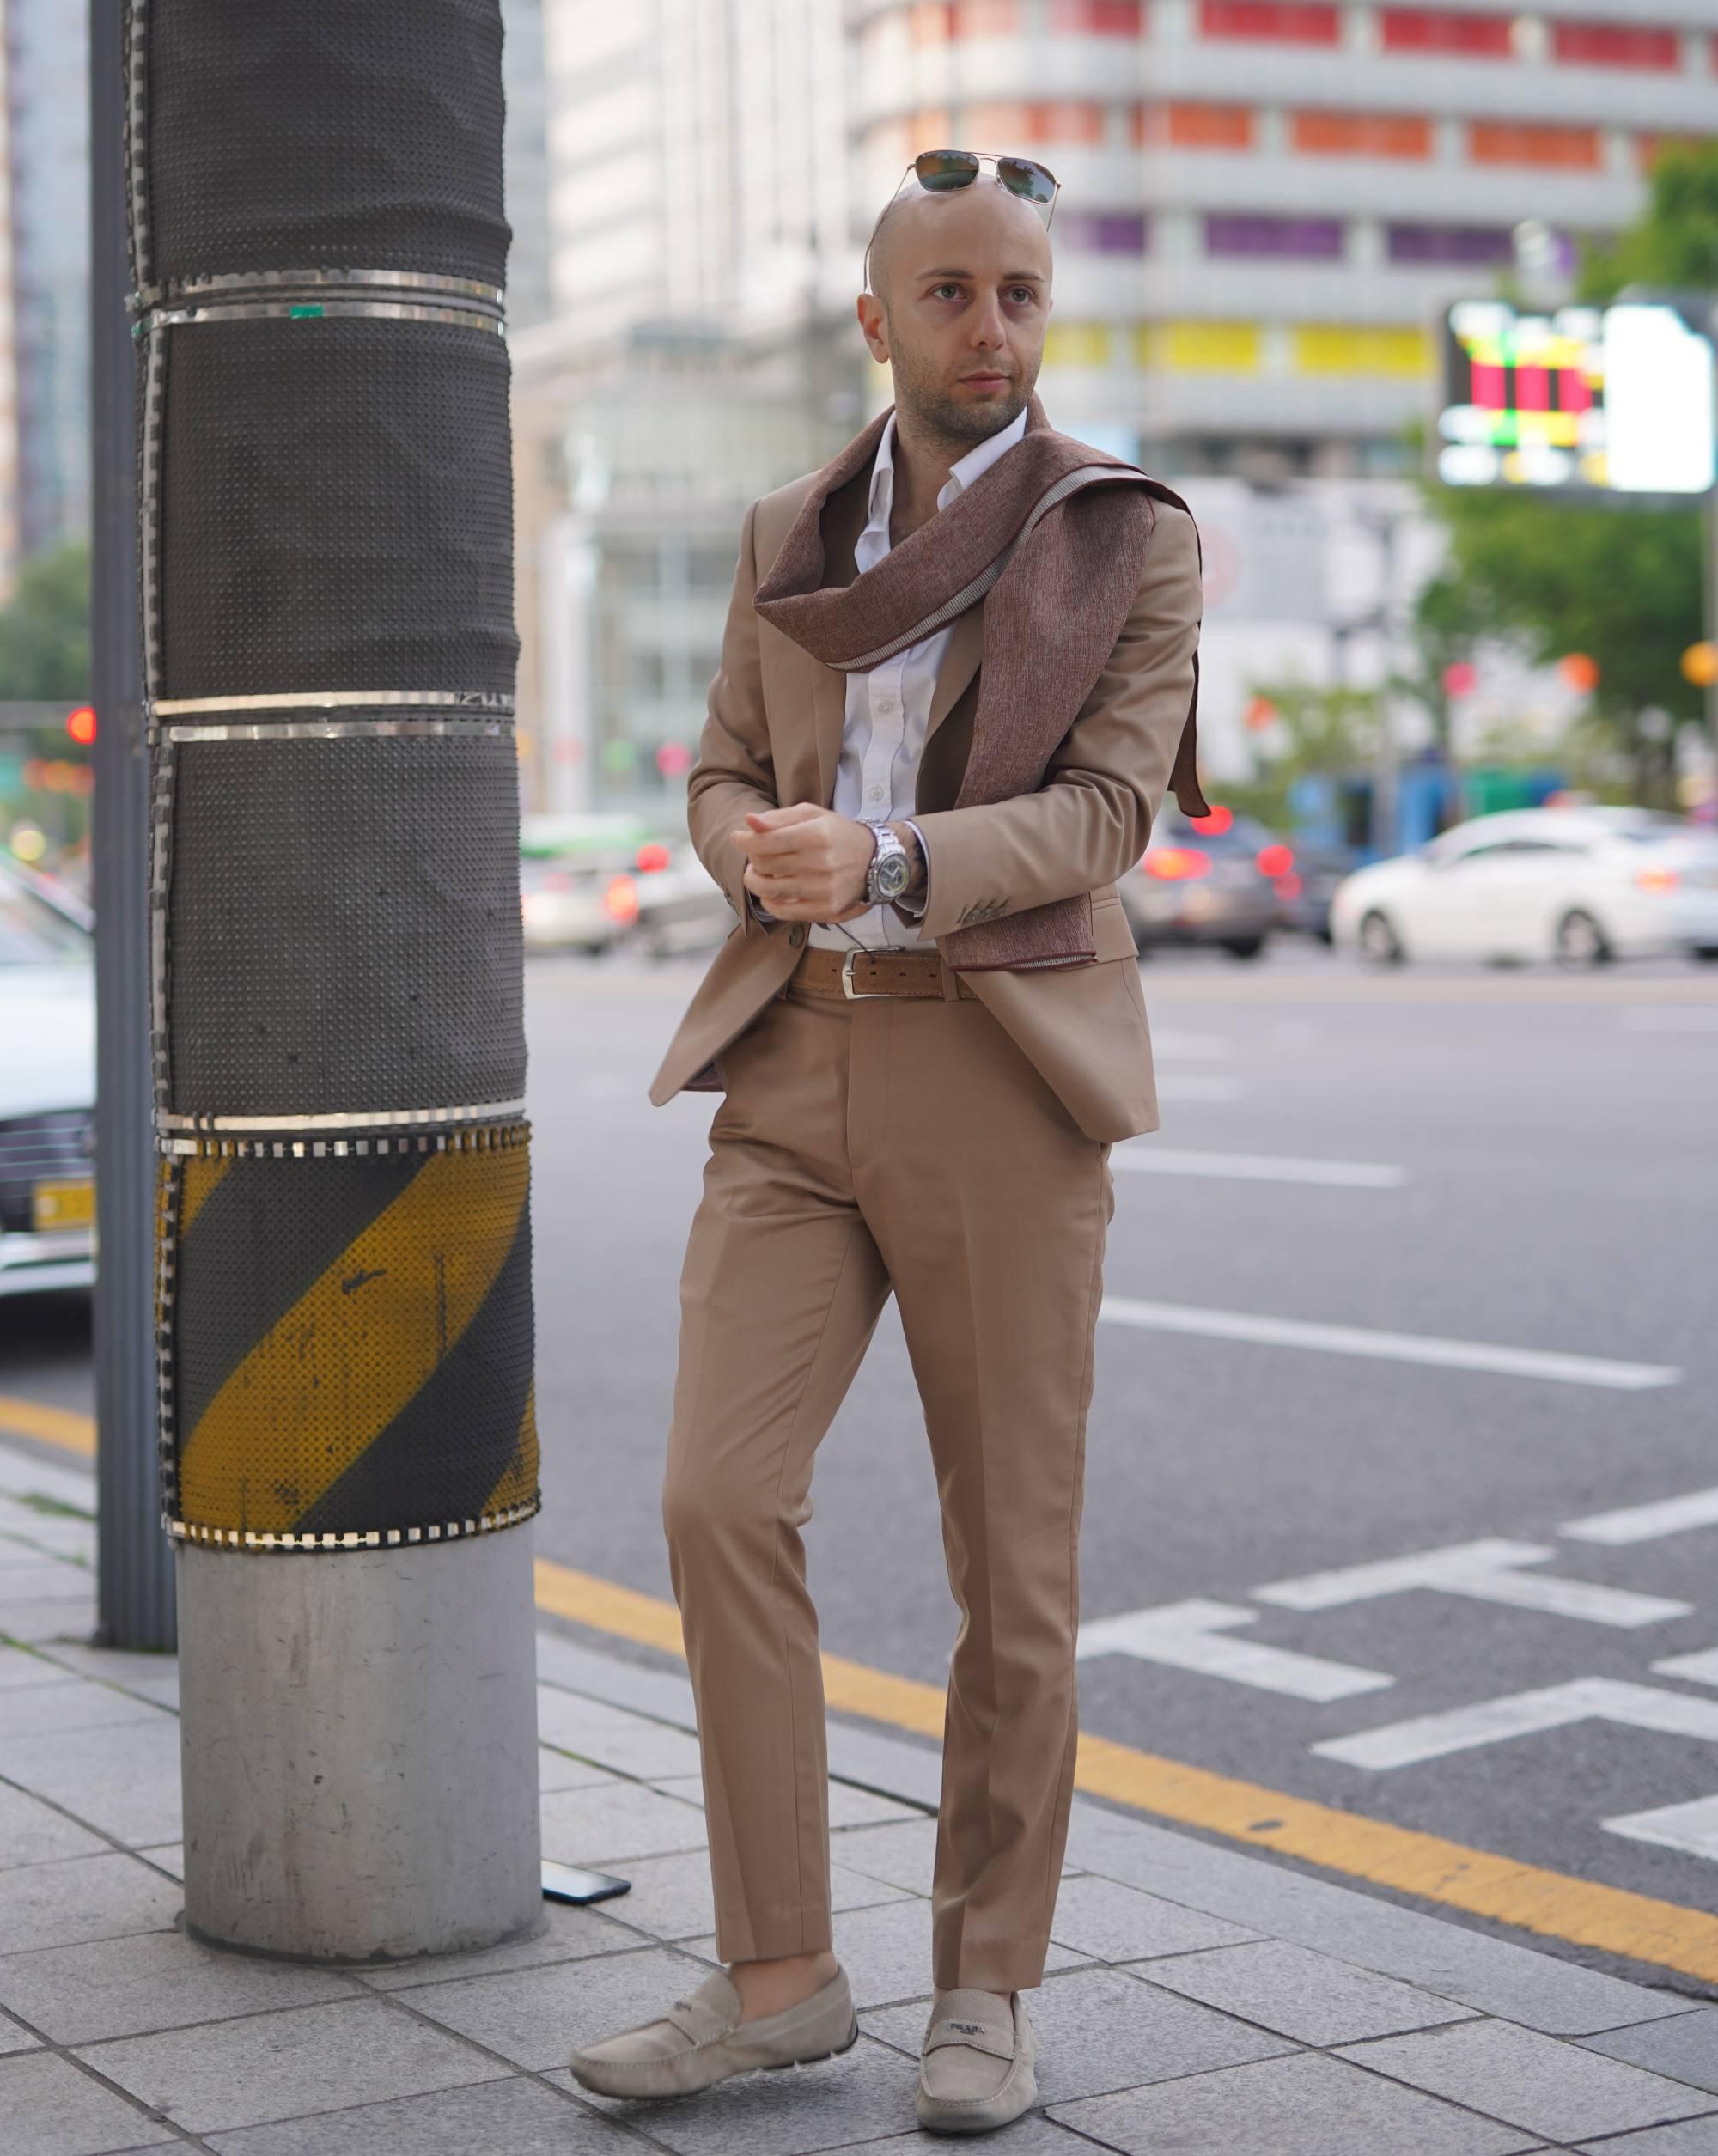 picture of lucio buffalmano, founder of ThePowerMoves